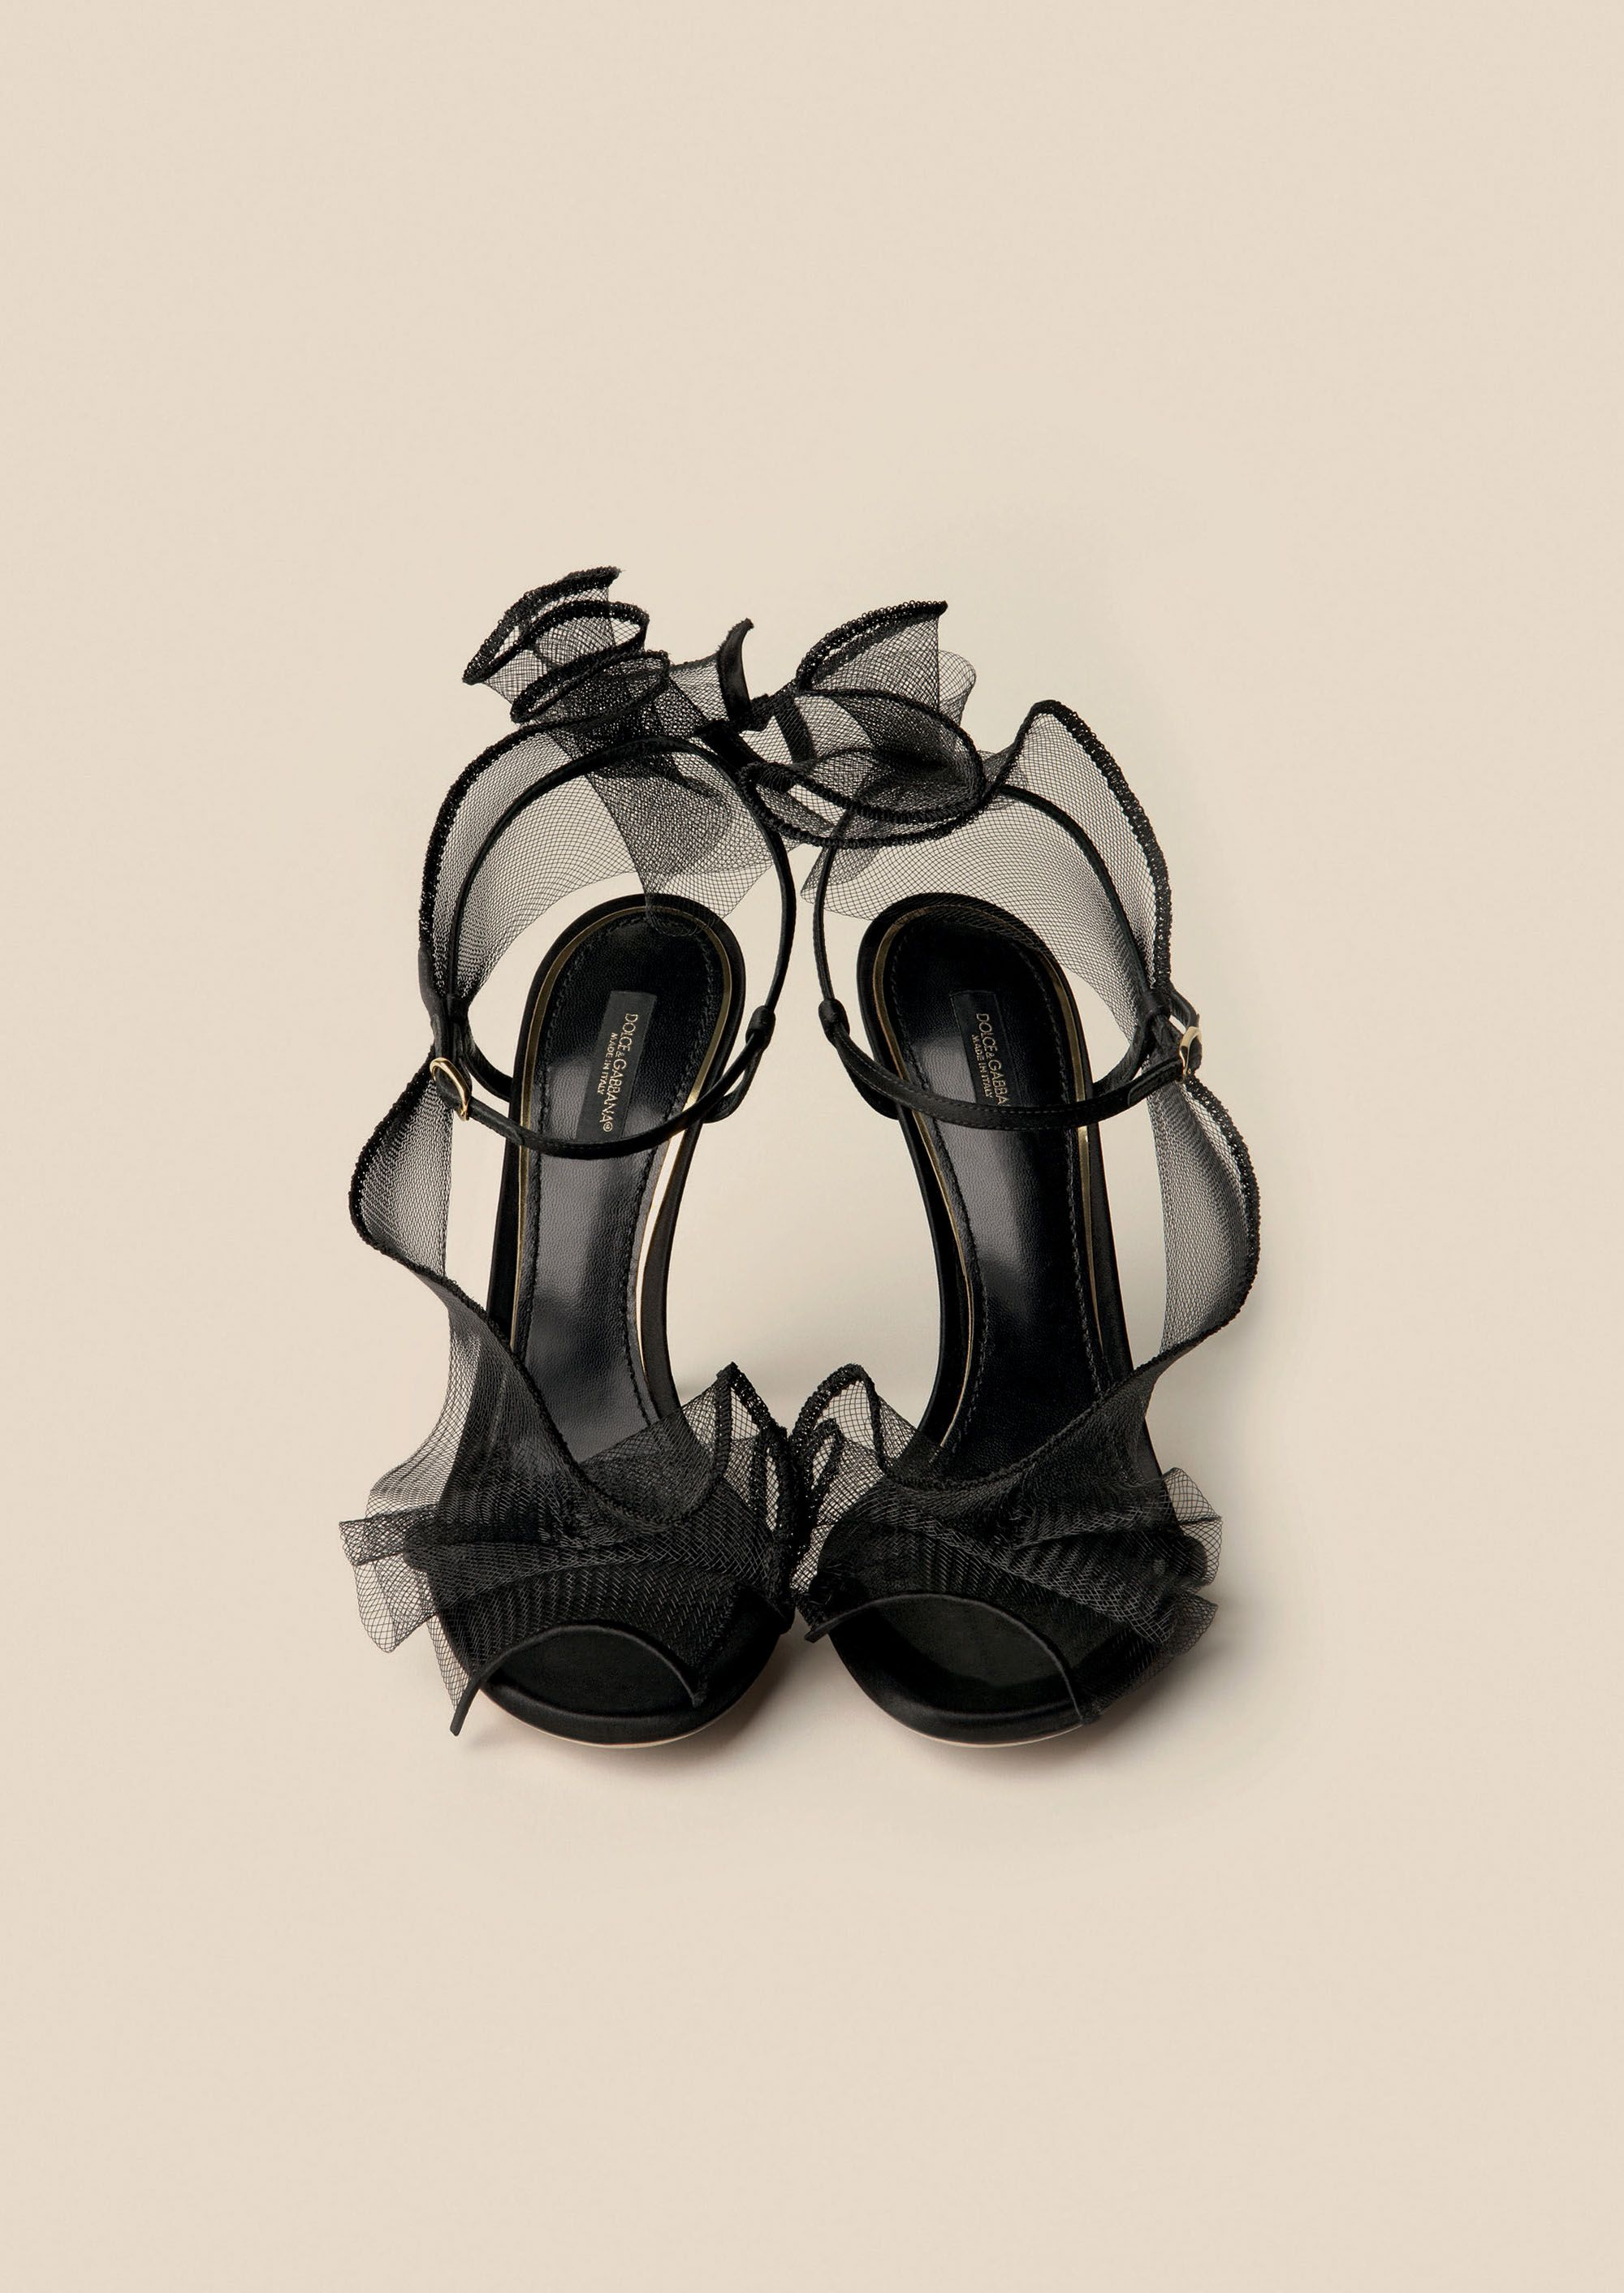 Sandals by Dolce & Gabbana (Spring / Summer 2013)